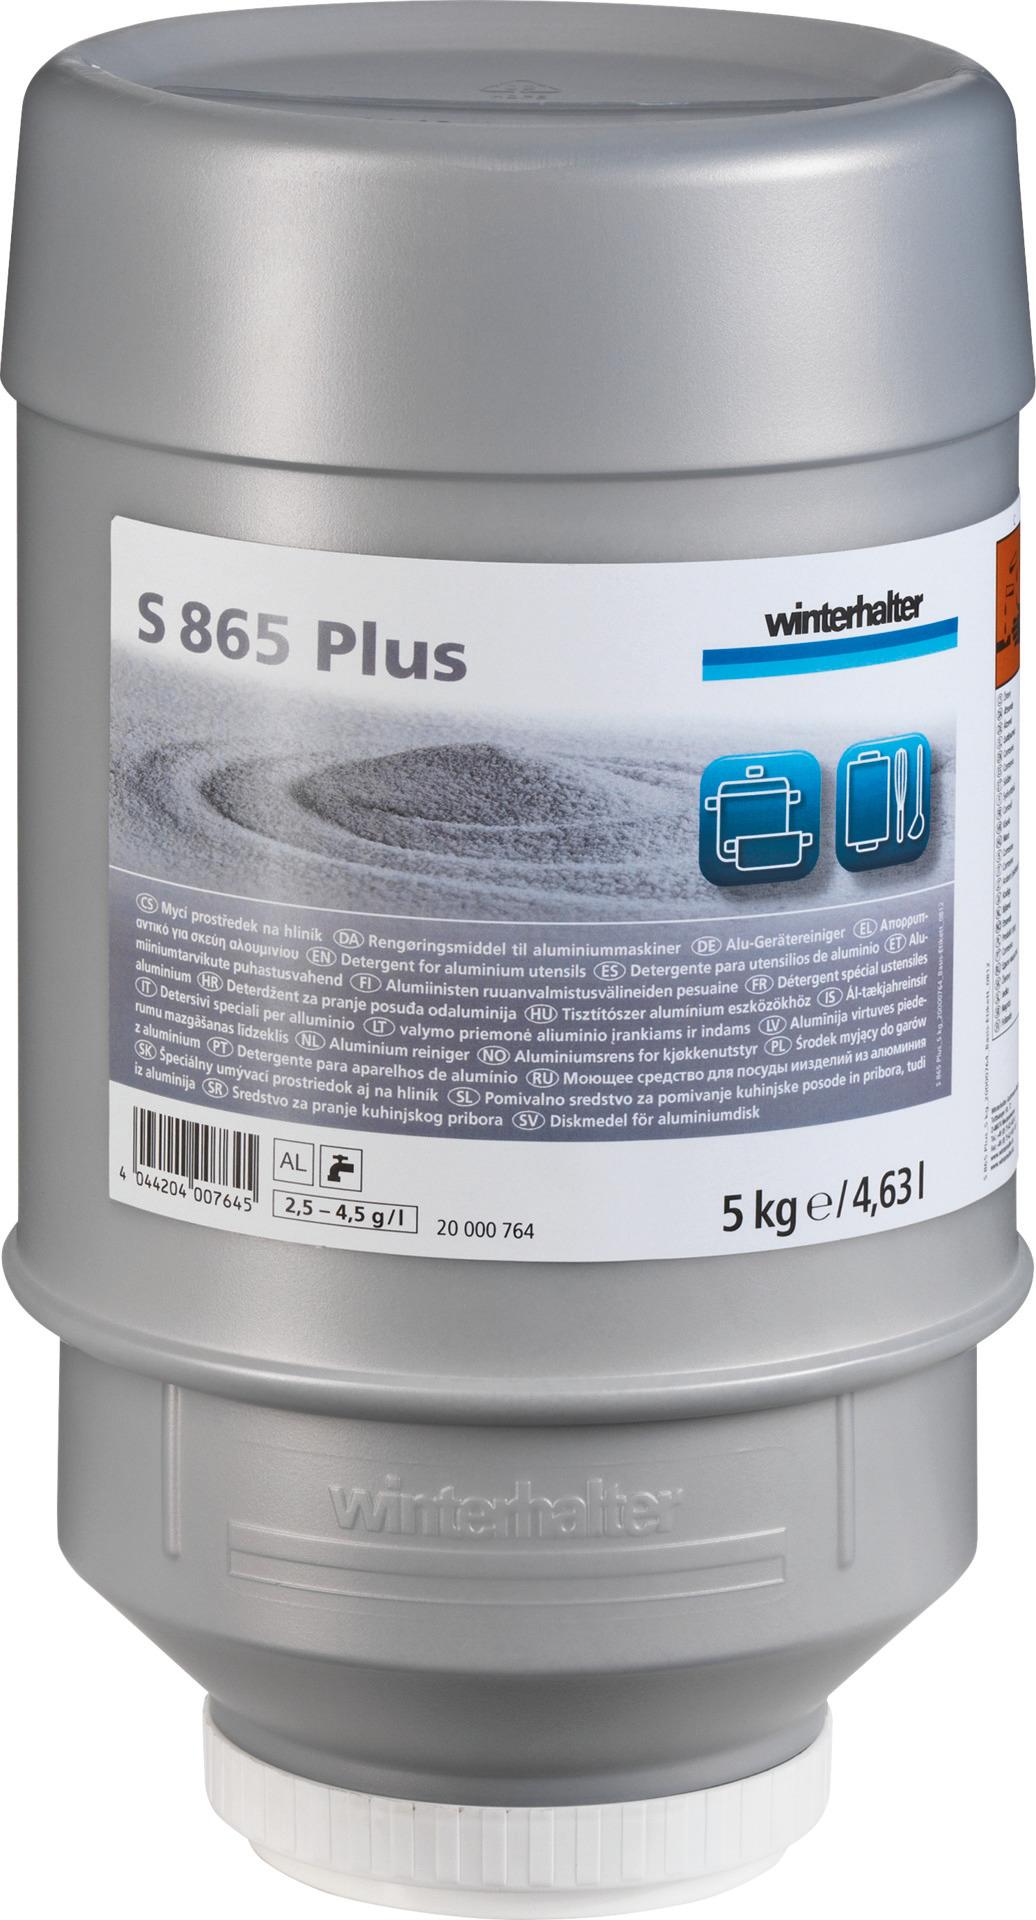 Alu-Gerätereiniger S 865 Plus / 10,00 kg / Karton je 2 Kartuschen